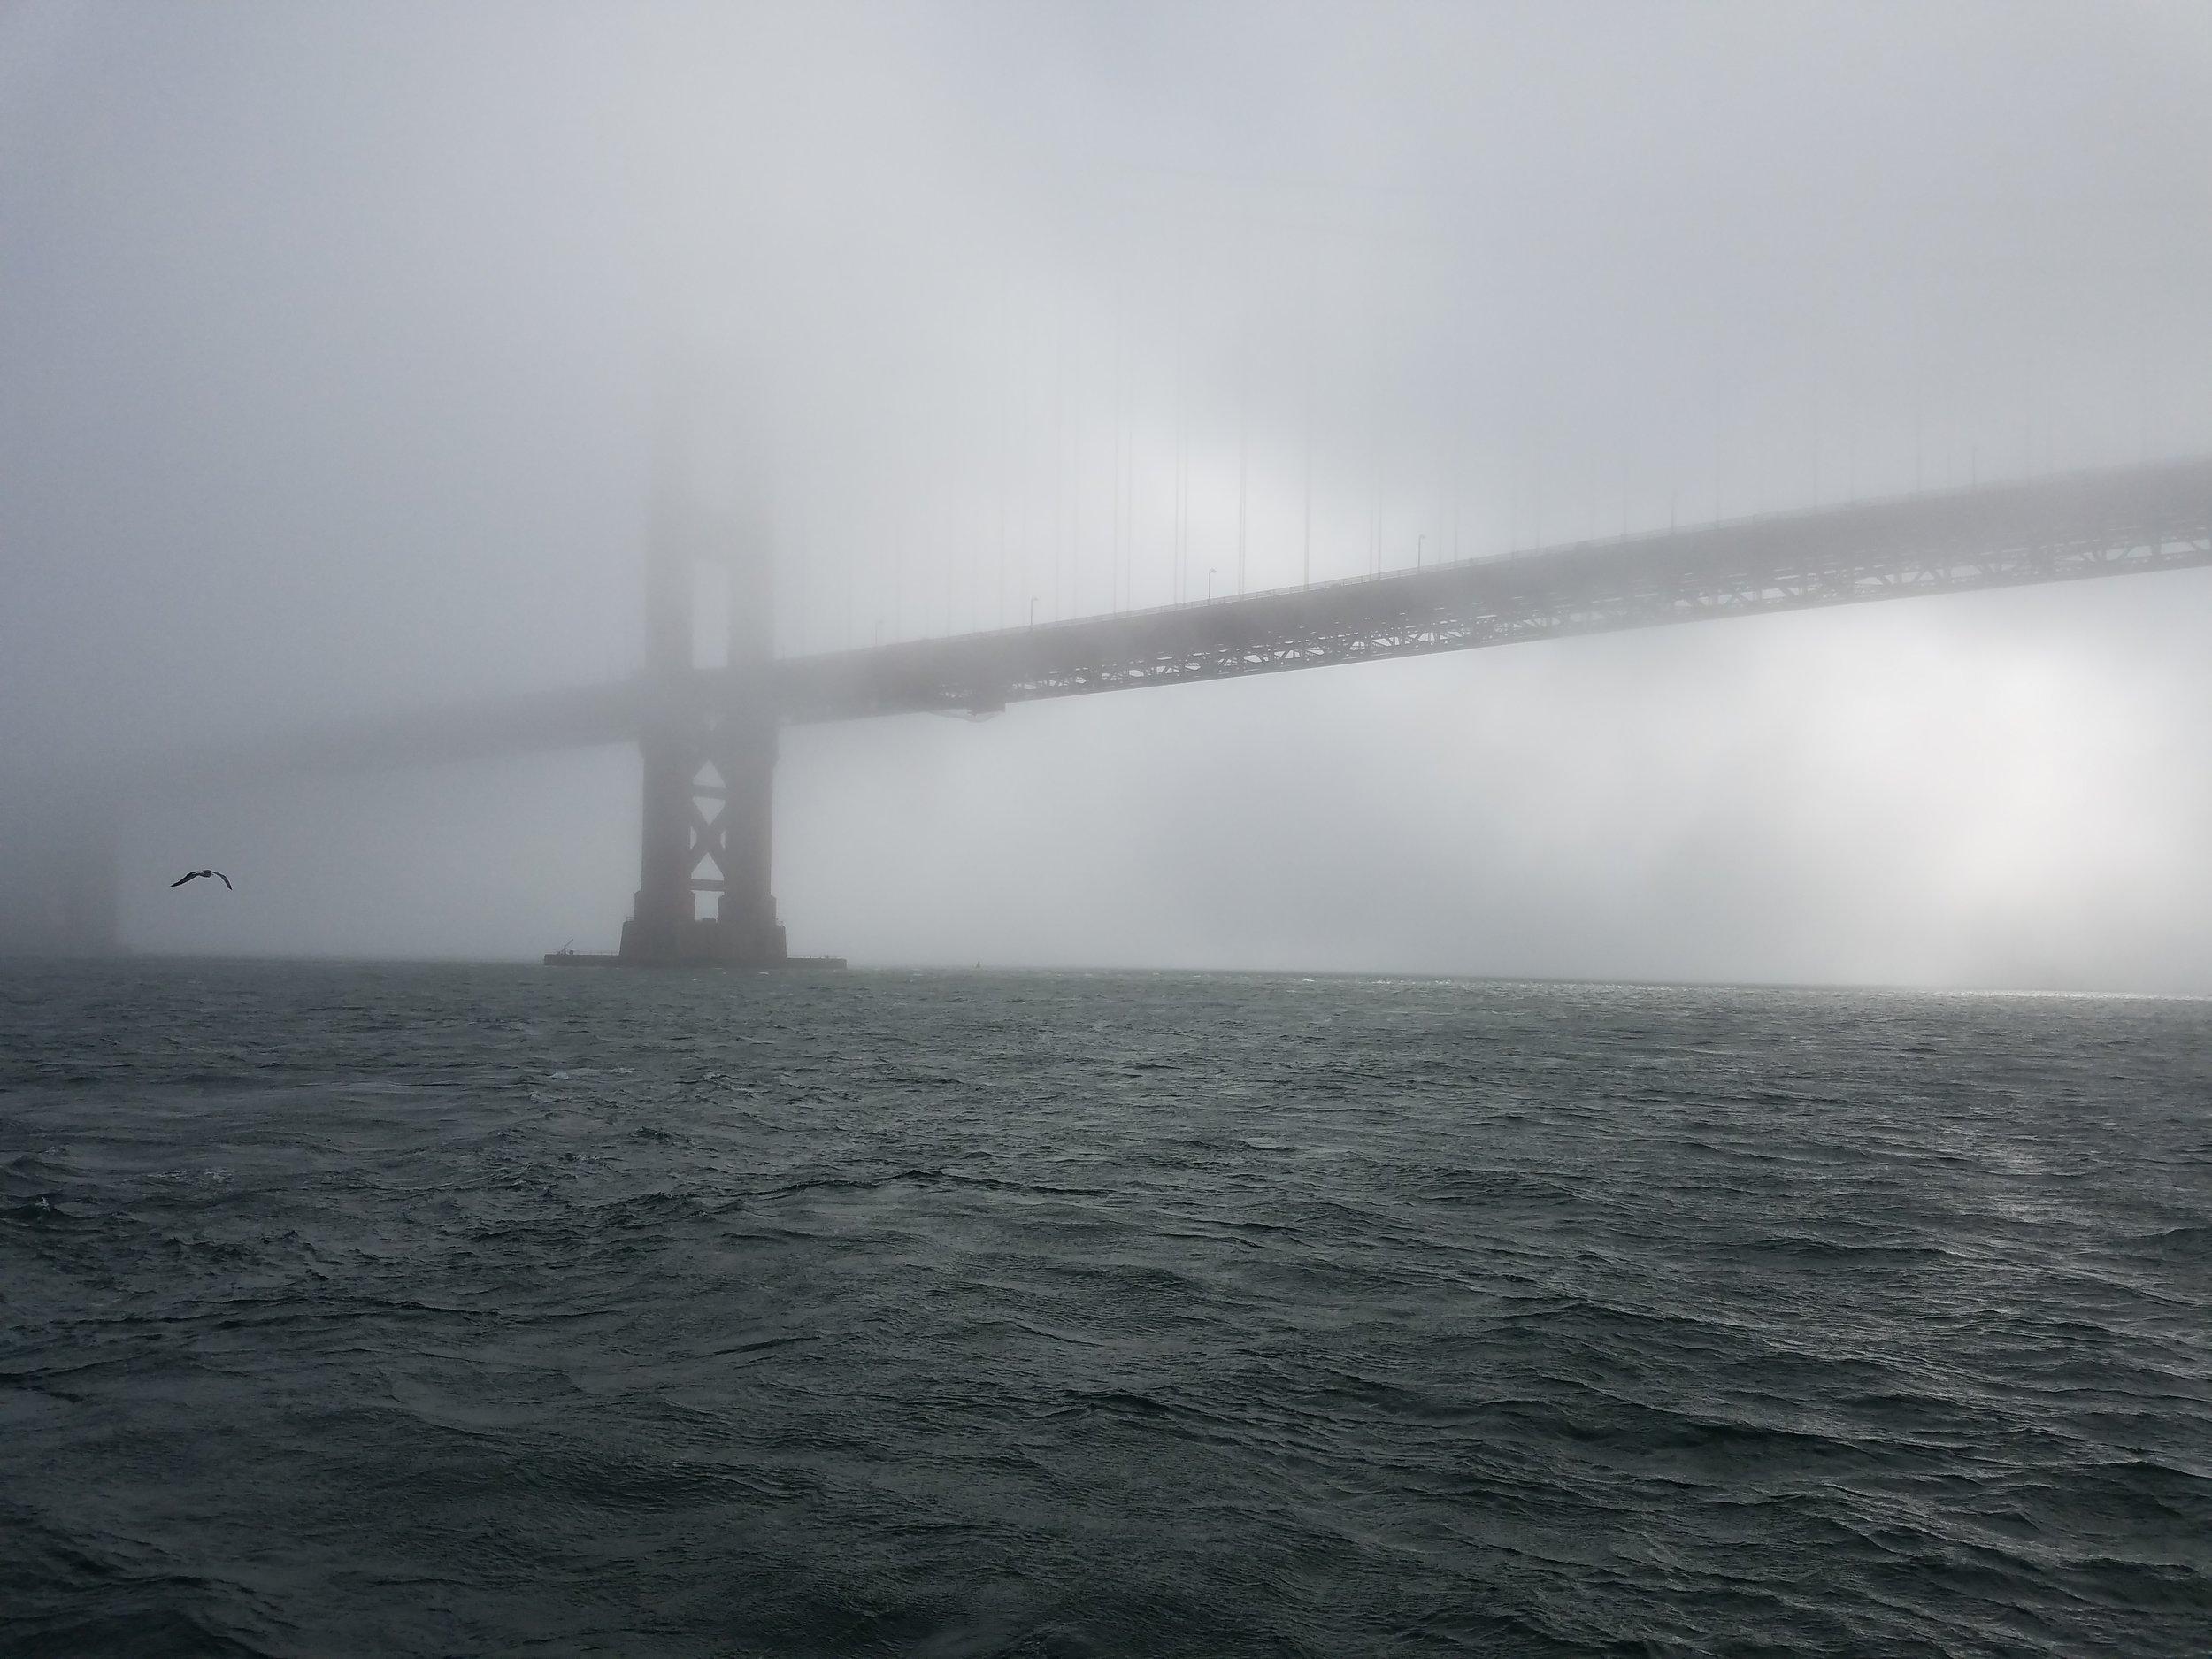 The bridge through the fog.